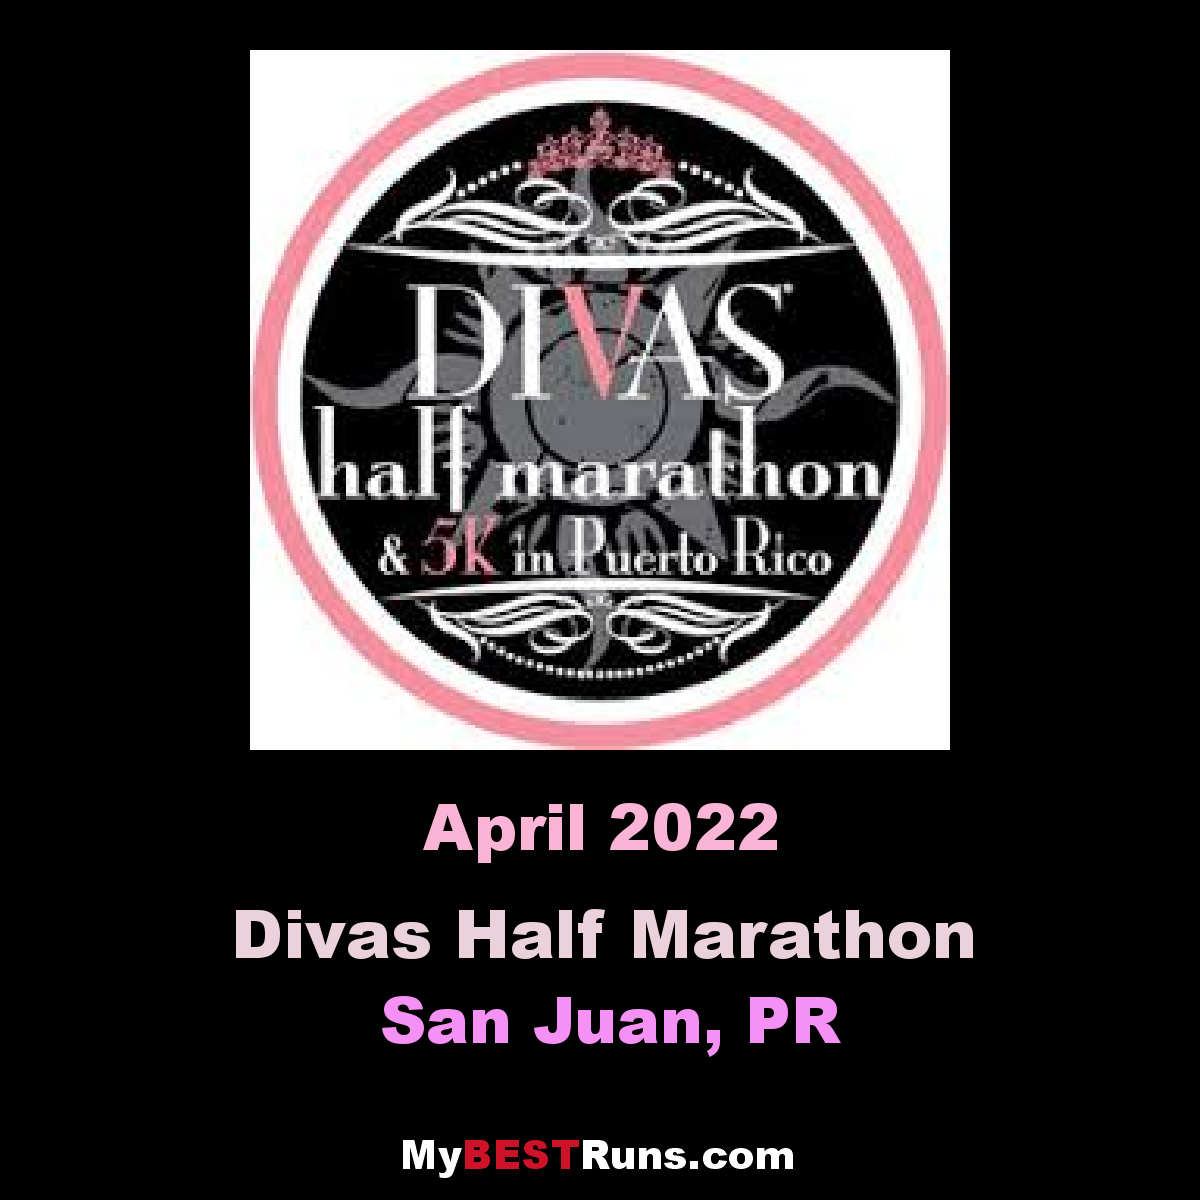 Divas Half Marathon